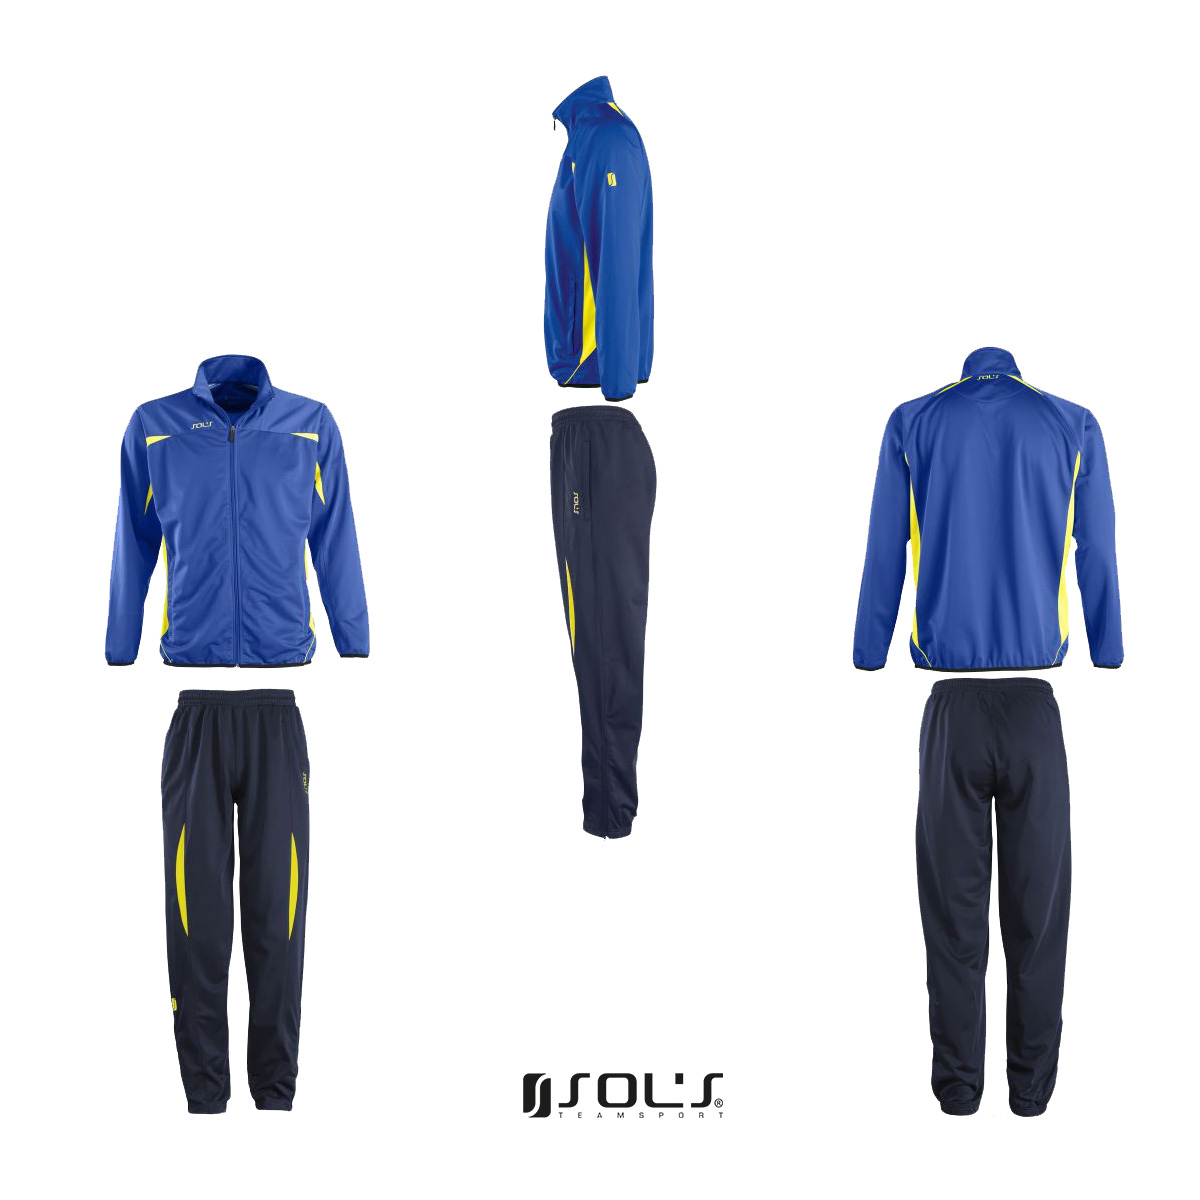 Neu Sols Herren Jogginganzug Trainingsanzug Sportanzug Fußballanzug Fitnessanzug